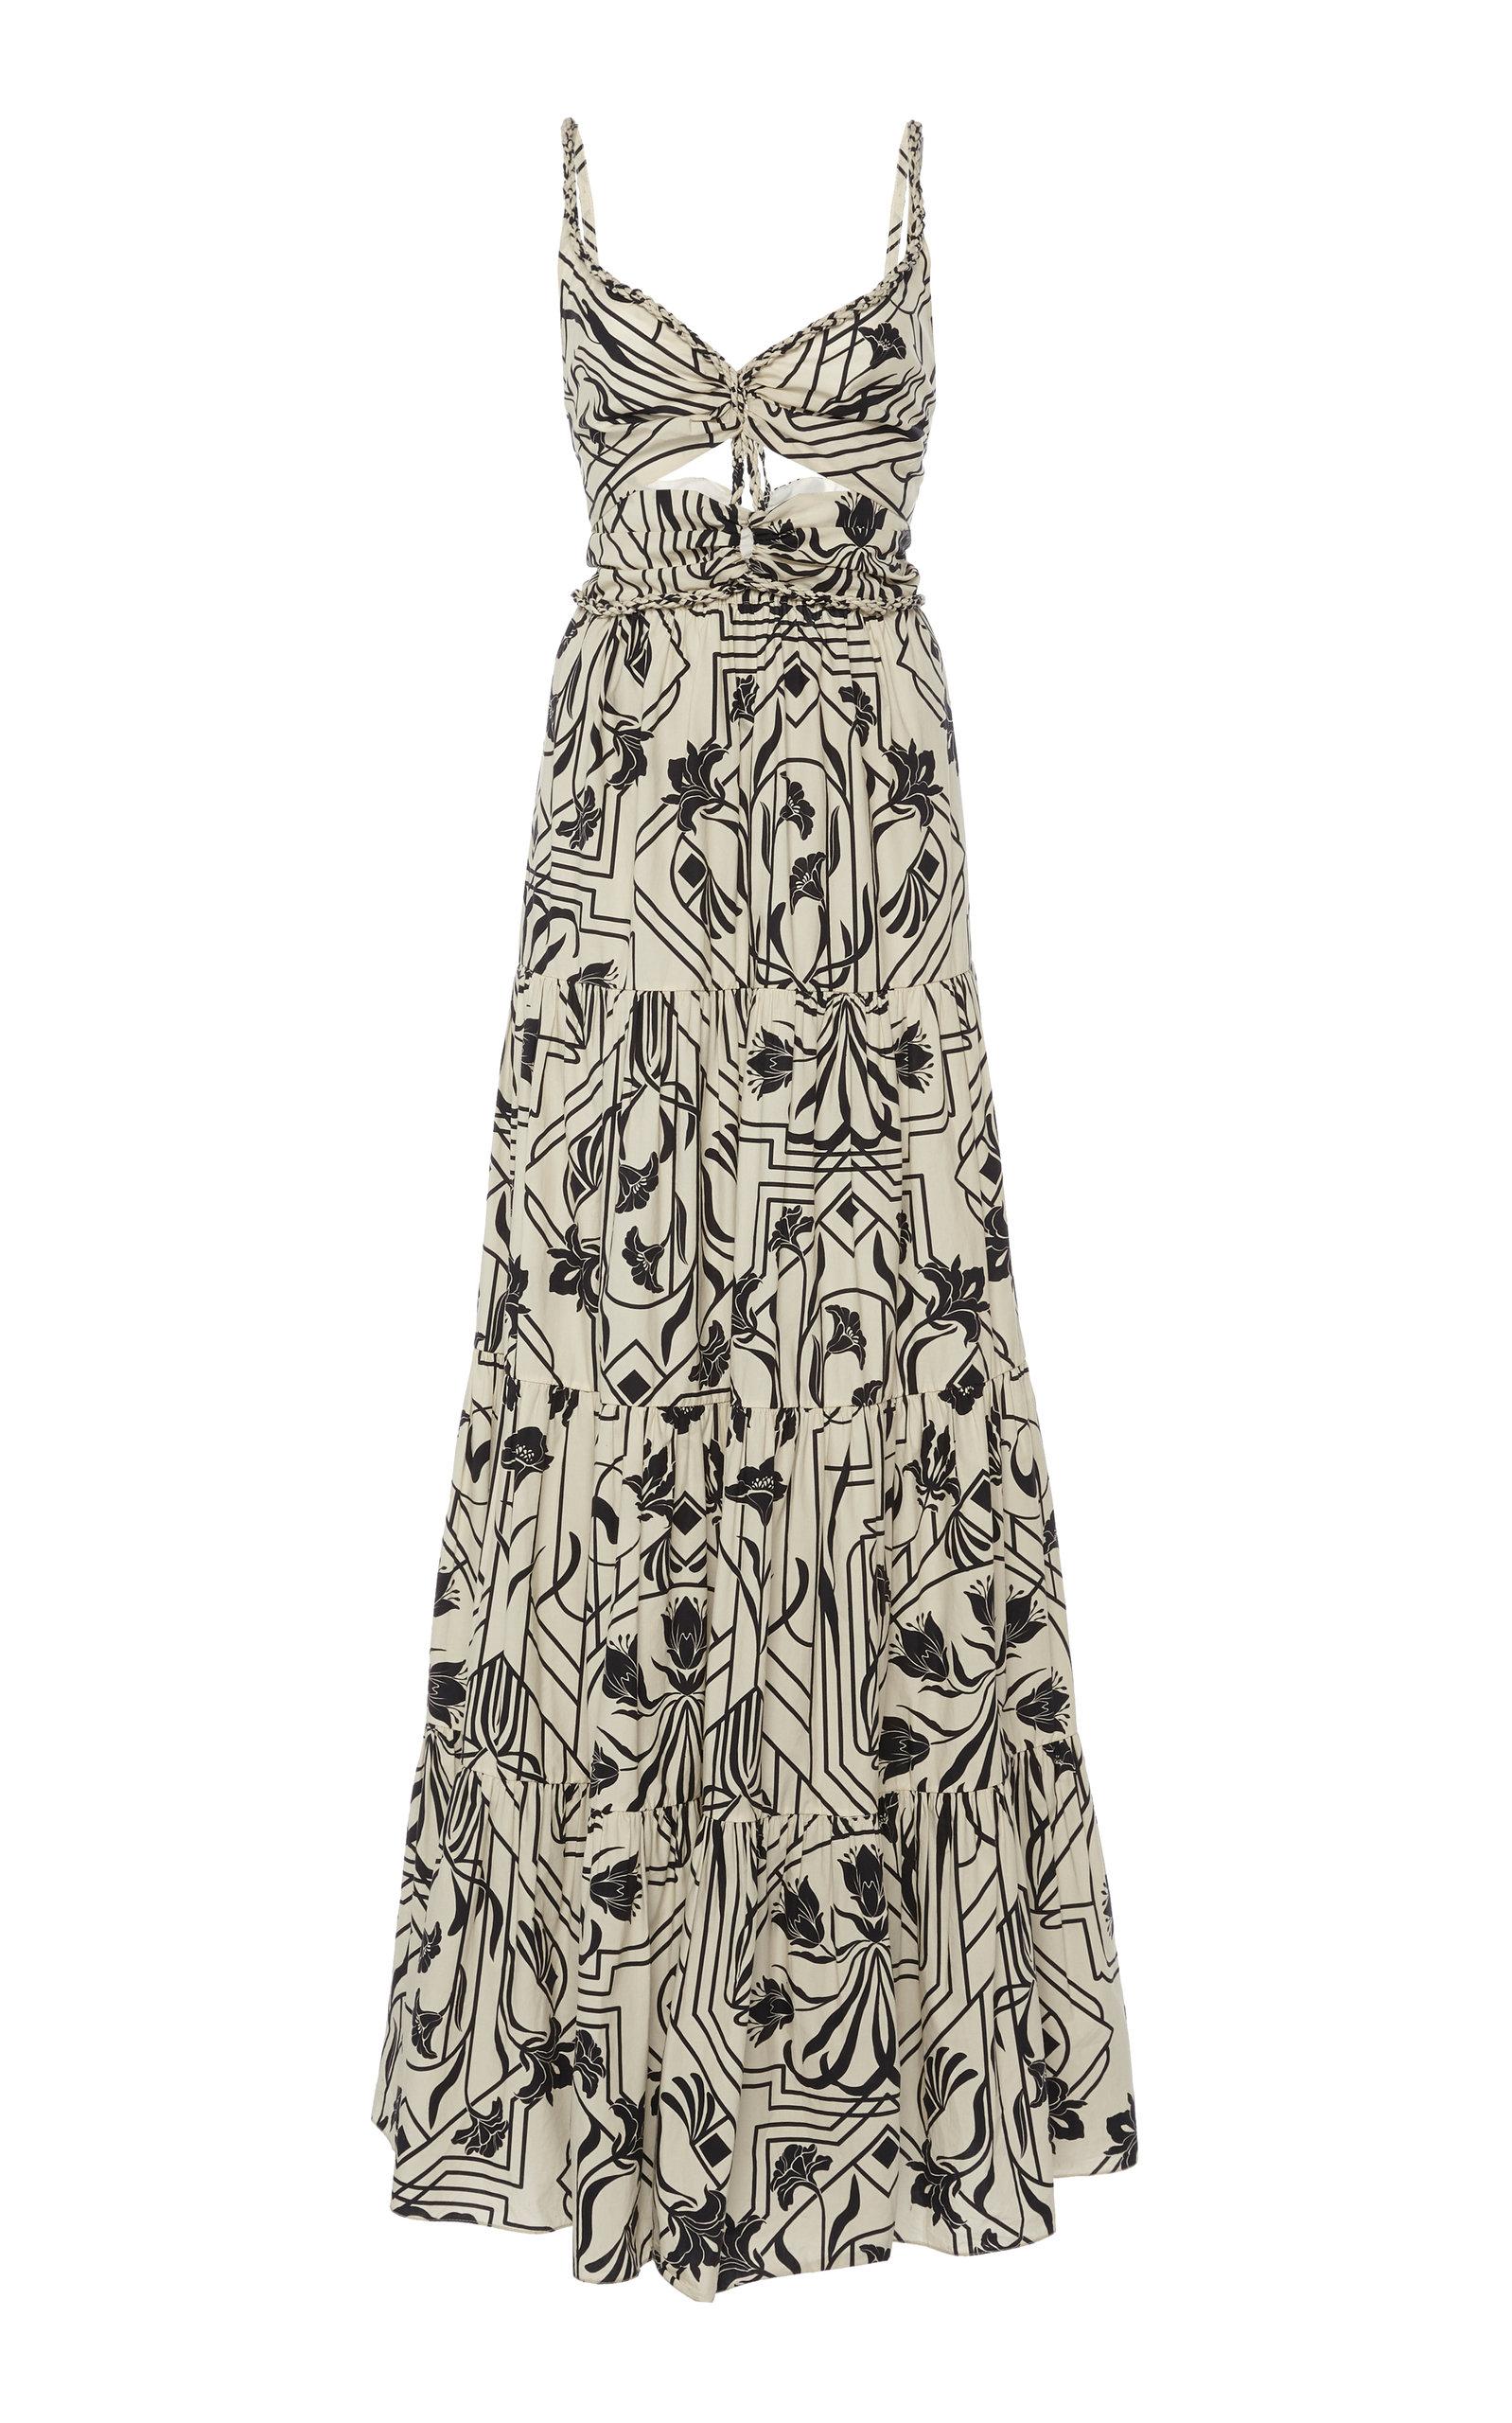 Buy Johanna Ortiz Floral Architecture Printed Cotton Maxi Dress online, shop Johanna Ortiz at the best price